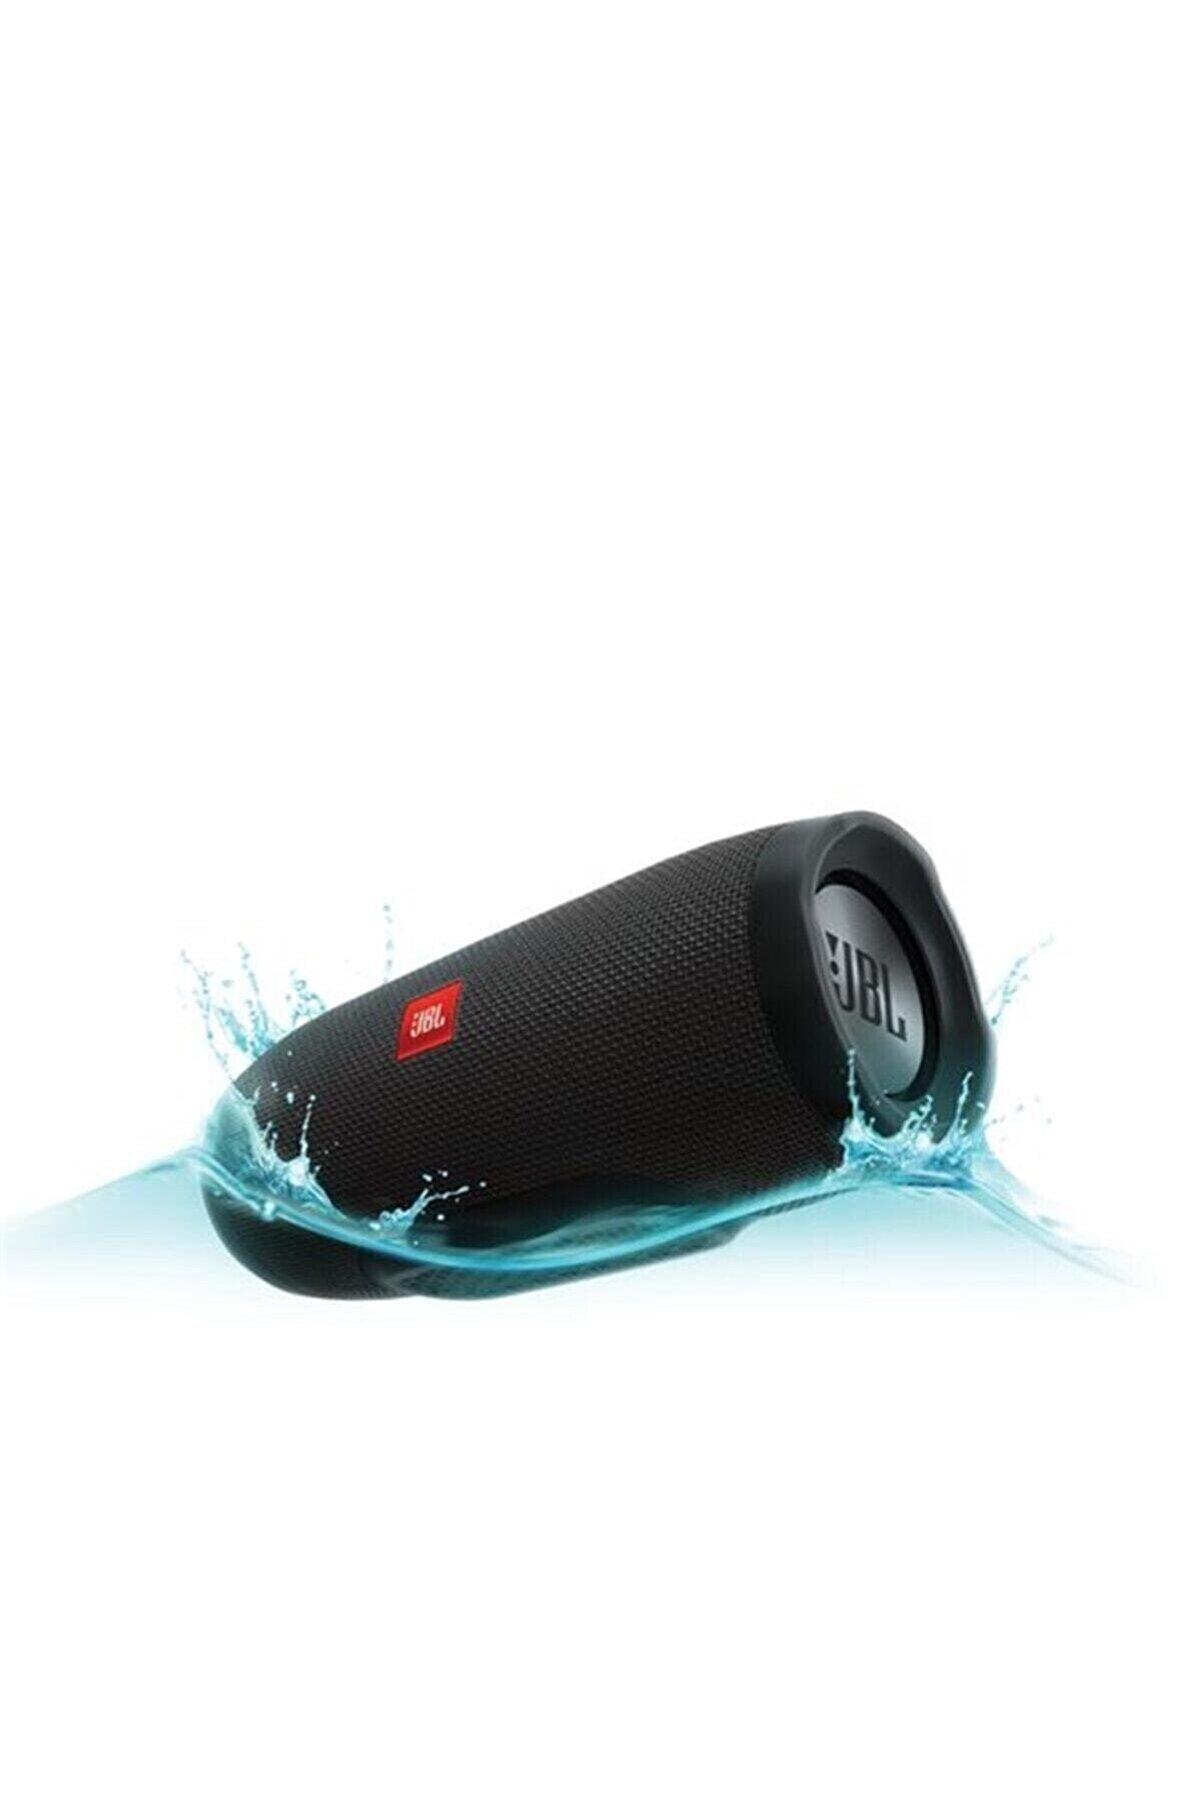 Gate Charge 3 Bluetooth Hoparlör Speaker Wireless Ses Bombası Ekstra Bass